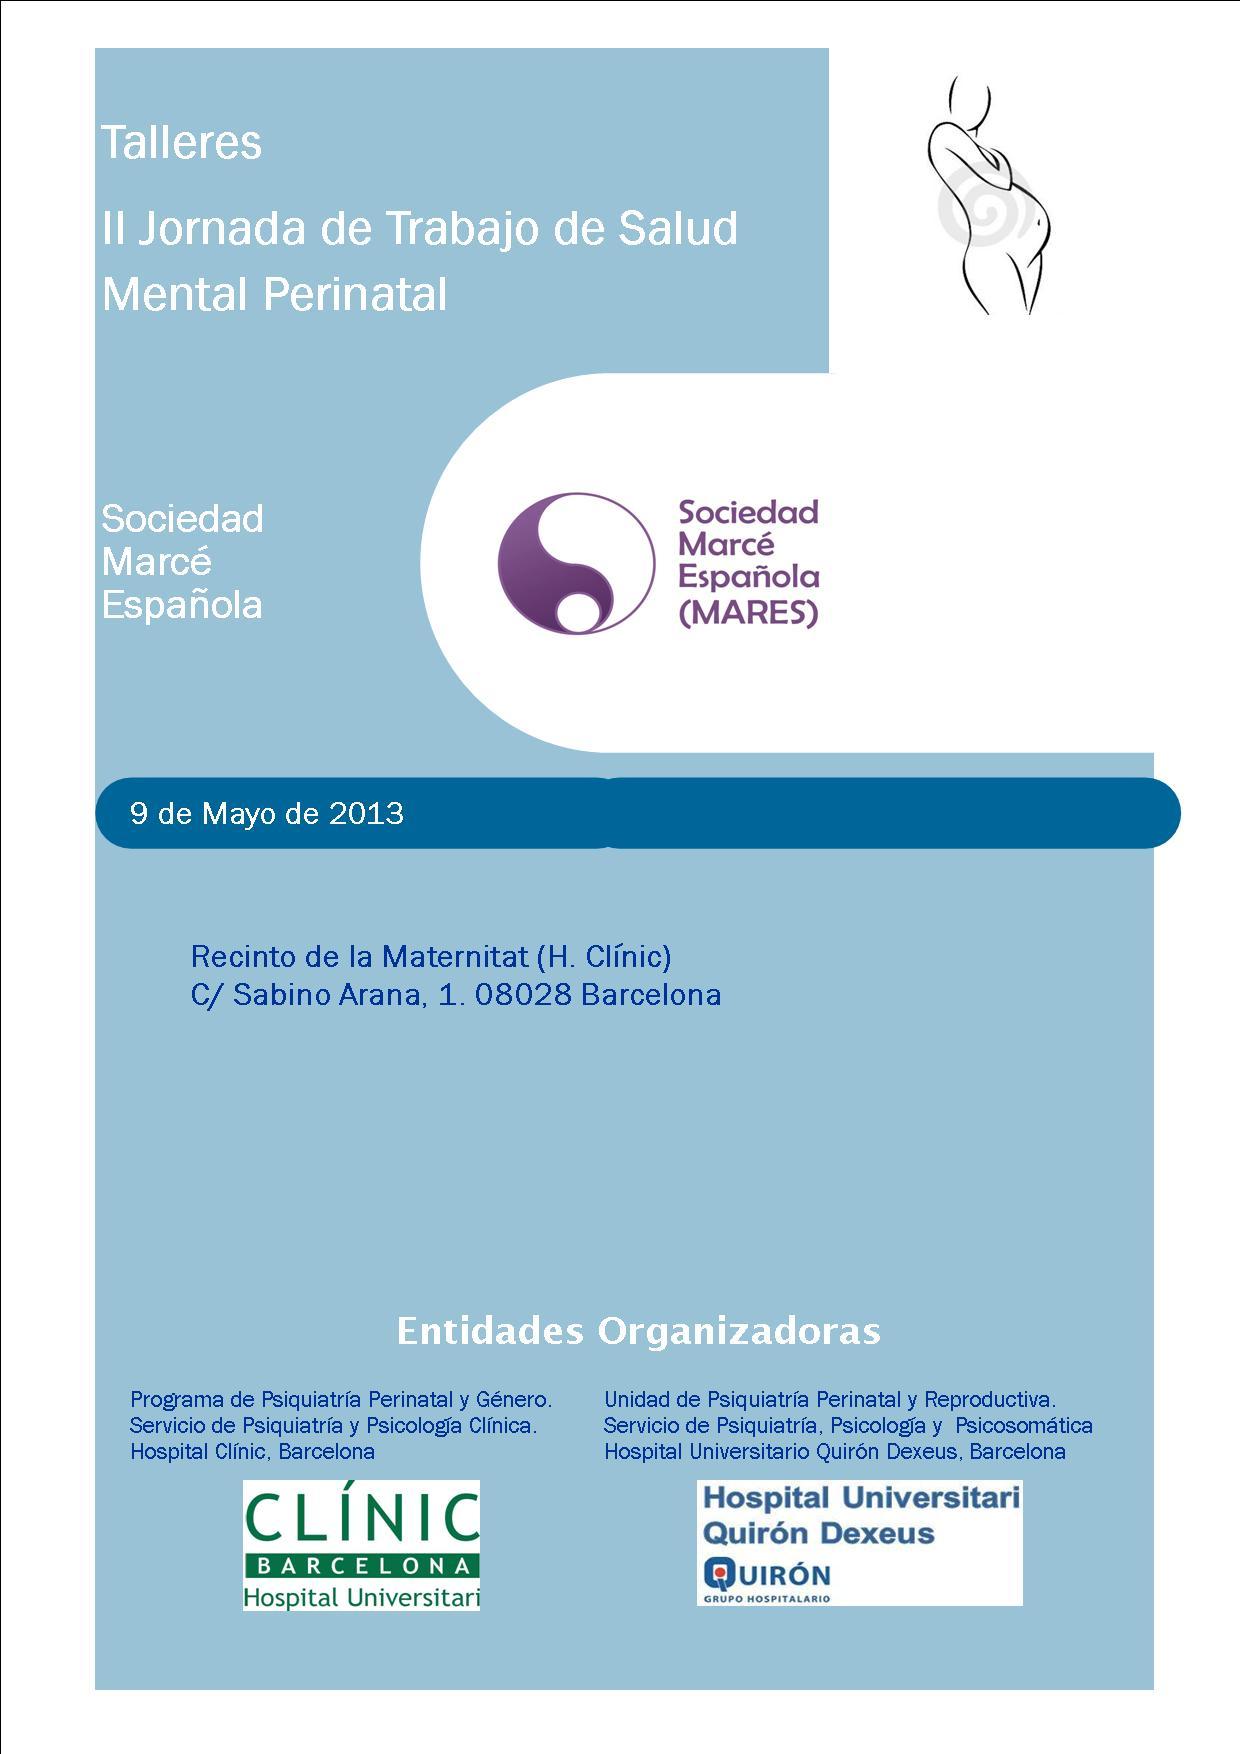 Taller de Duelo por pérdida perinatal: abordaje terapéutico